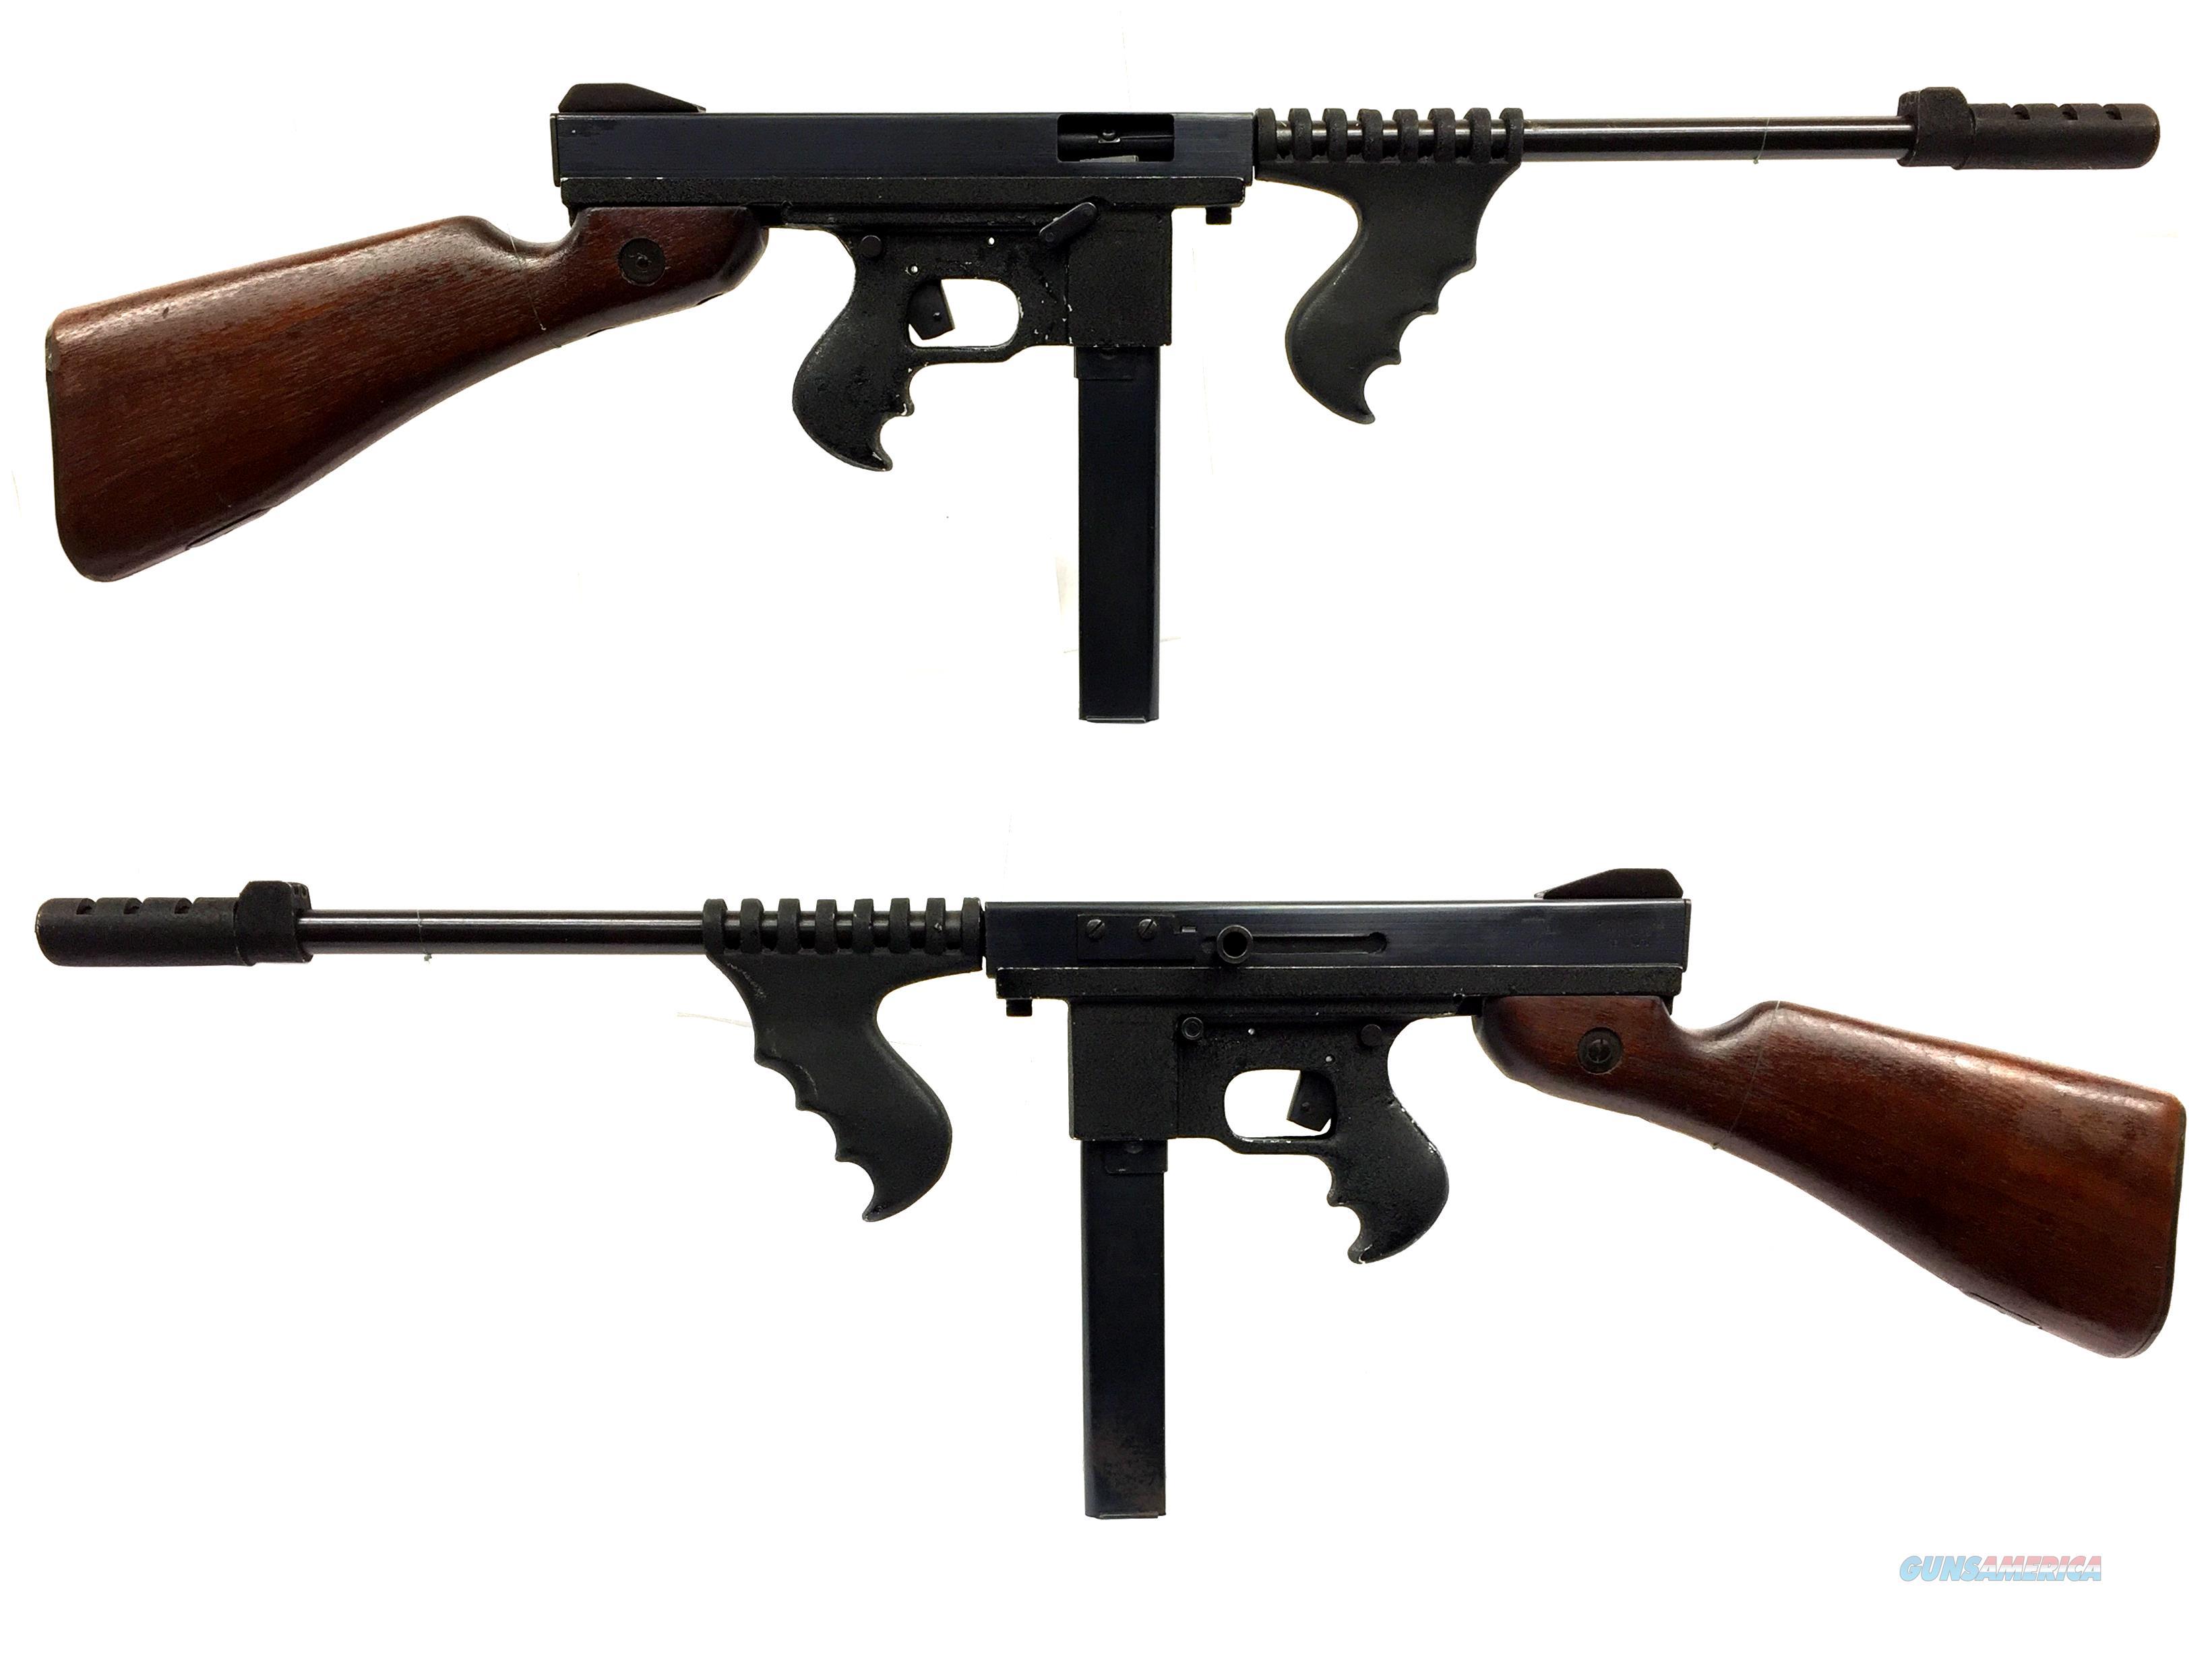 Apache Arms Co .45 Cal Model Semi-Automatic Carbine  Guns > Rifles > Thompson Subguns/Semi-Auto